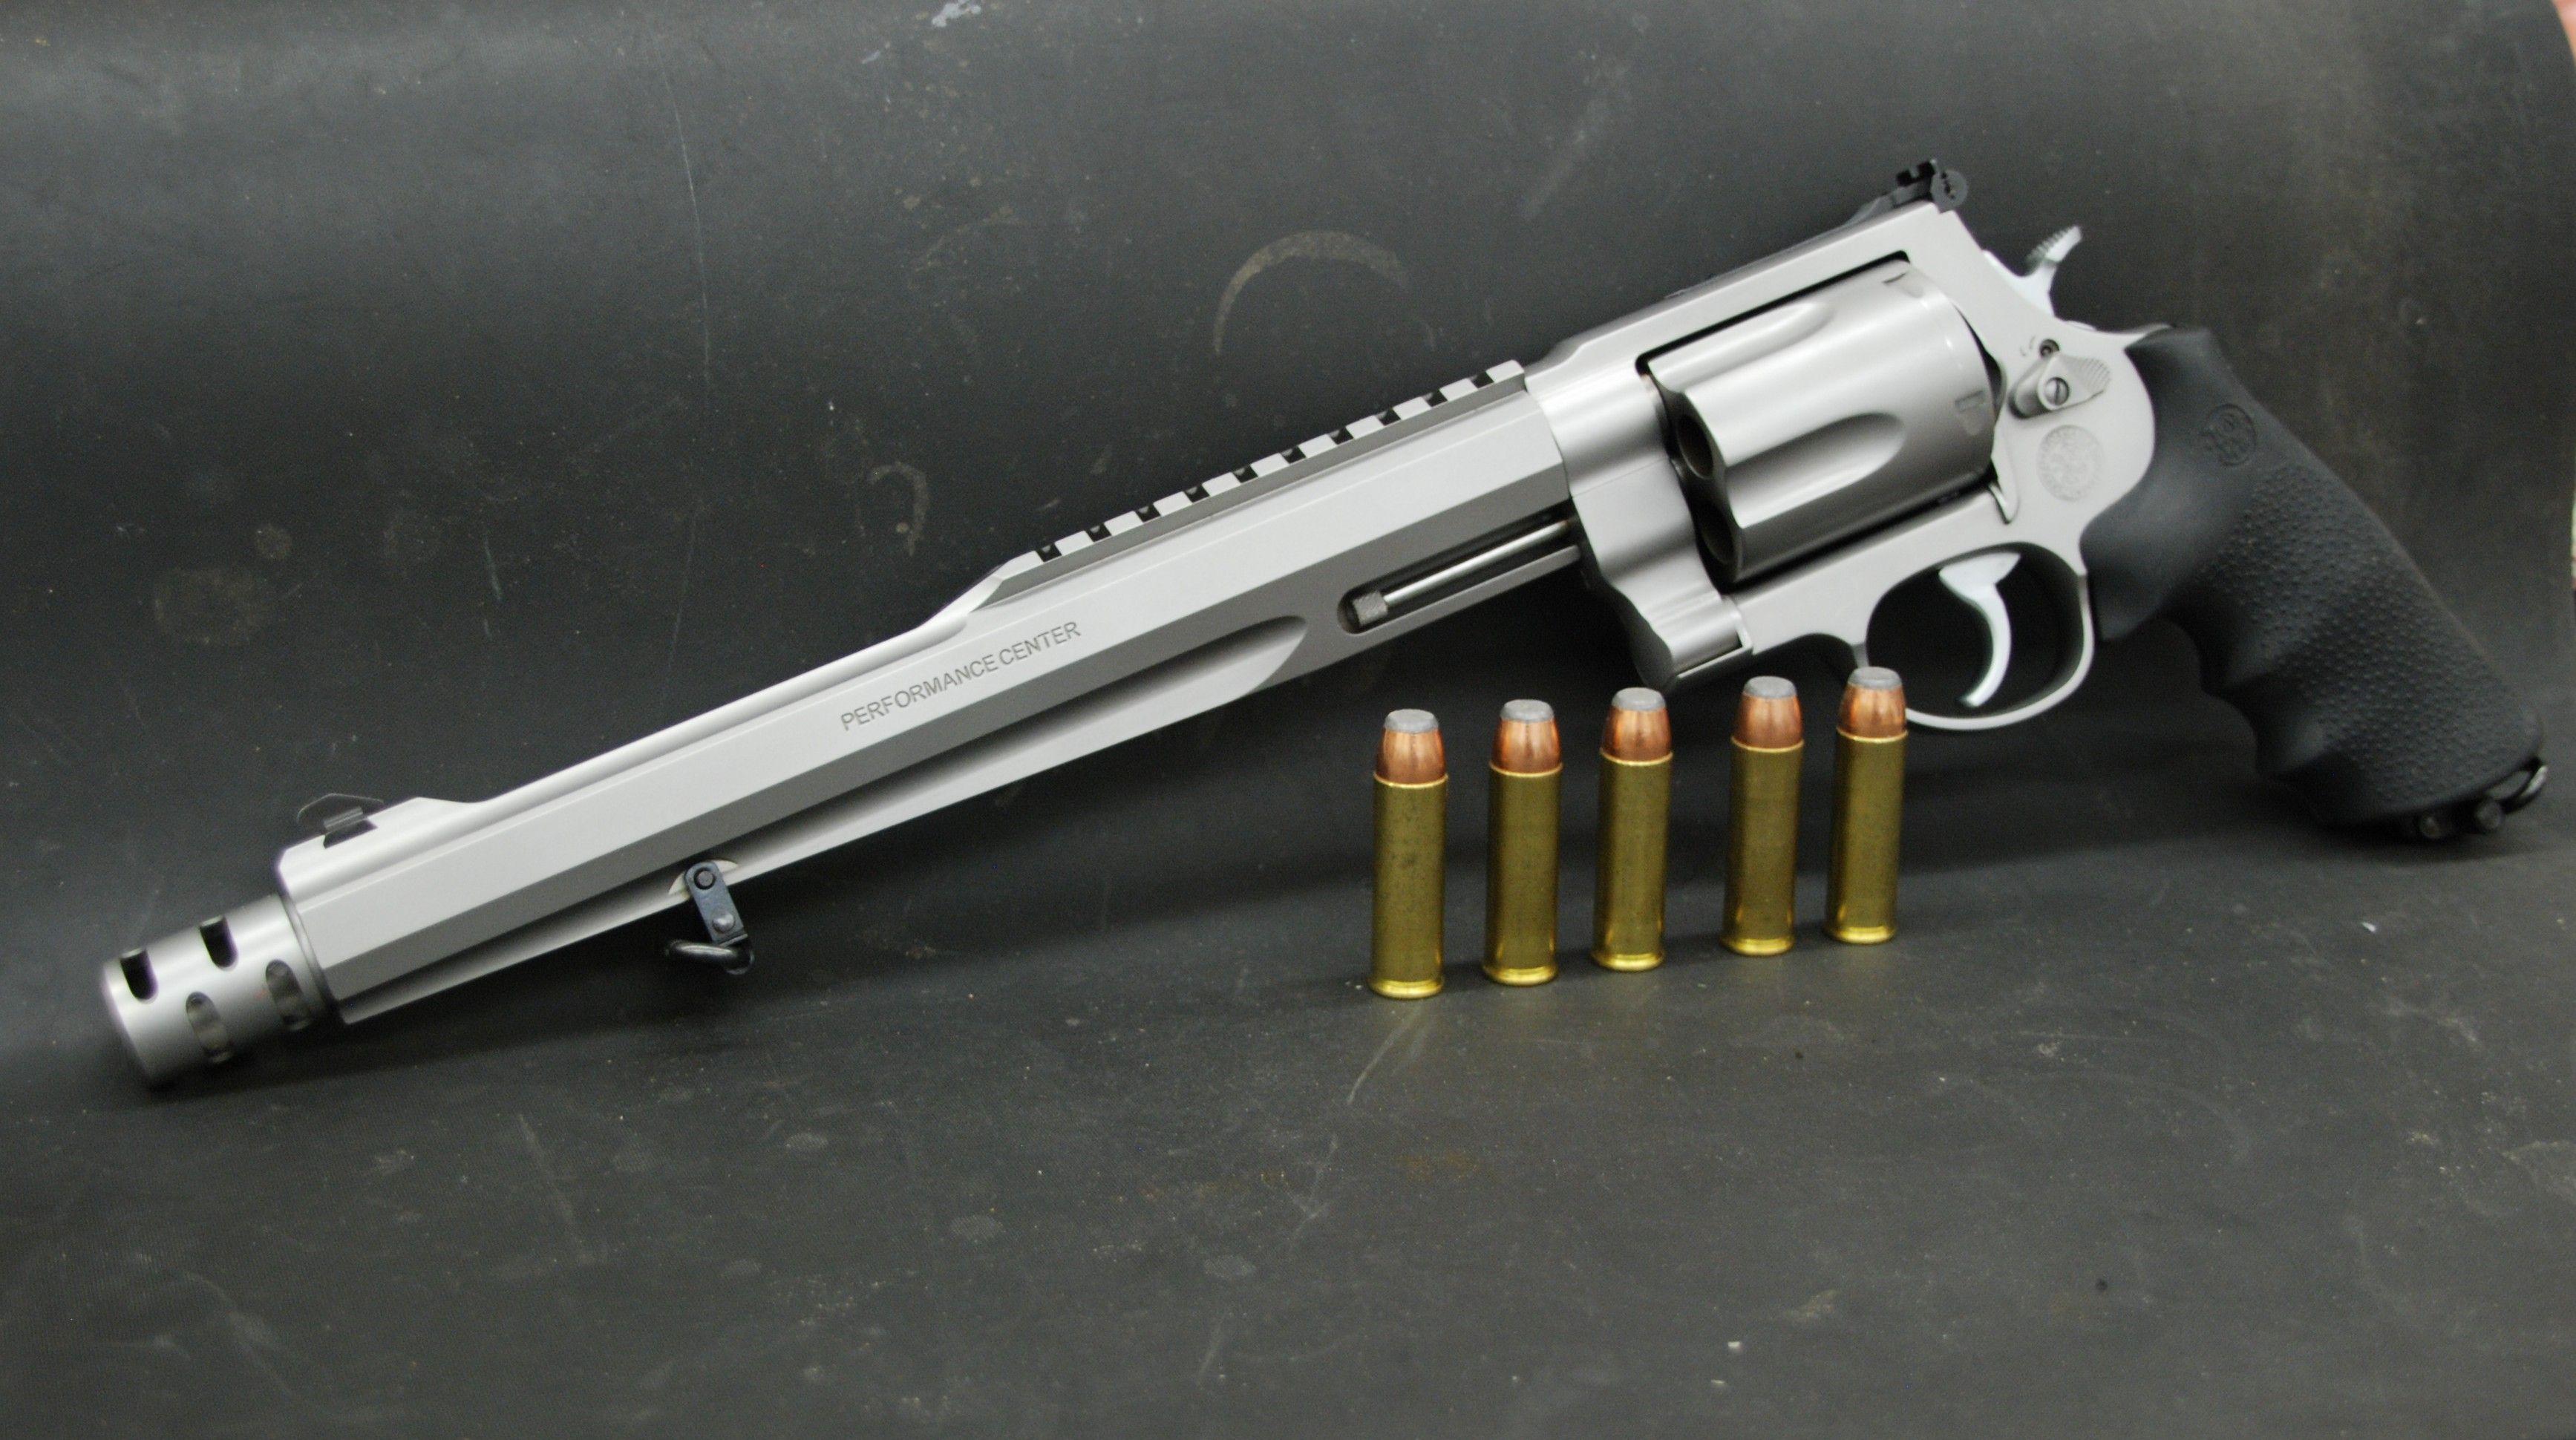 Оружие видео магнм фото 500-227